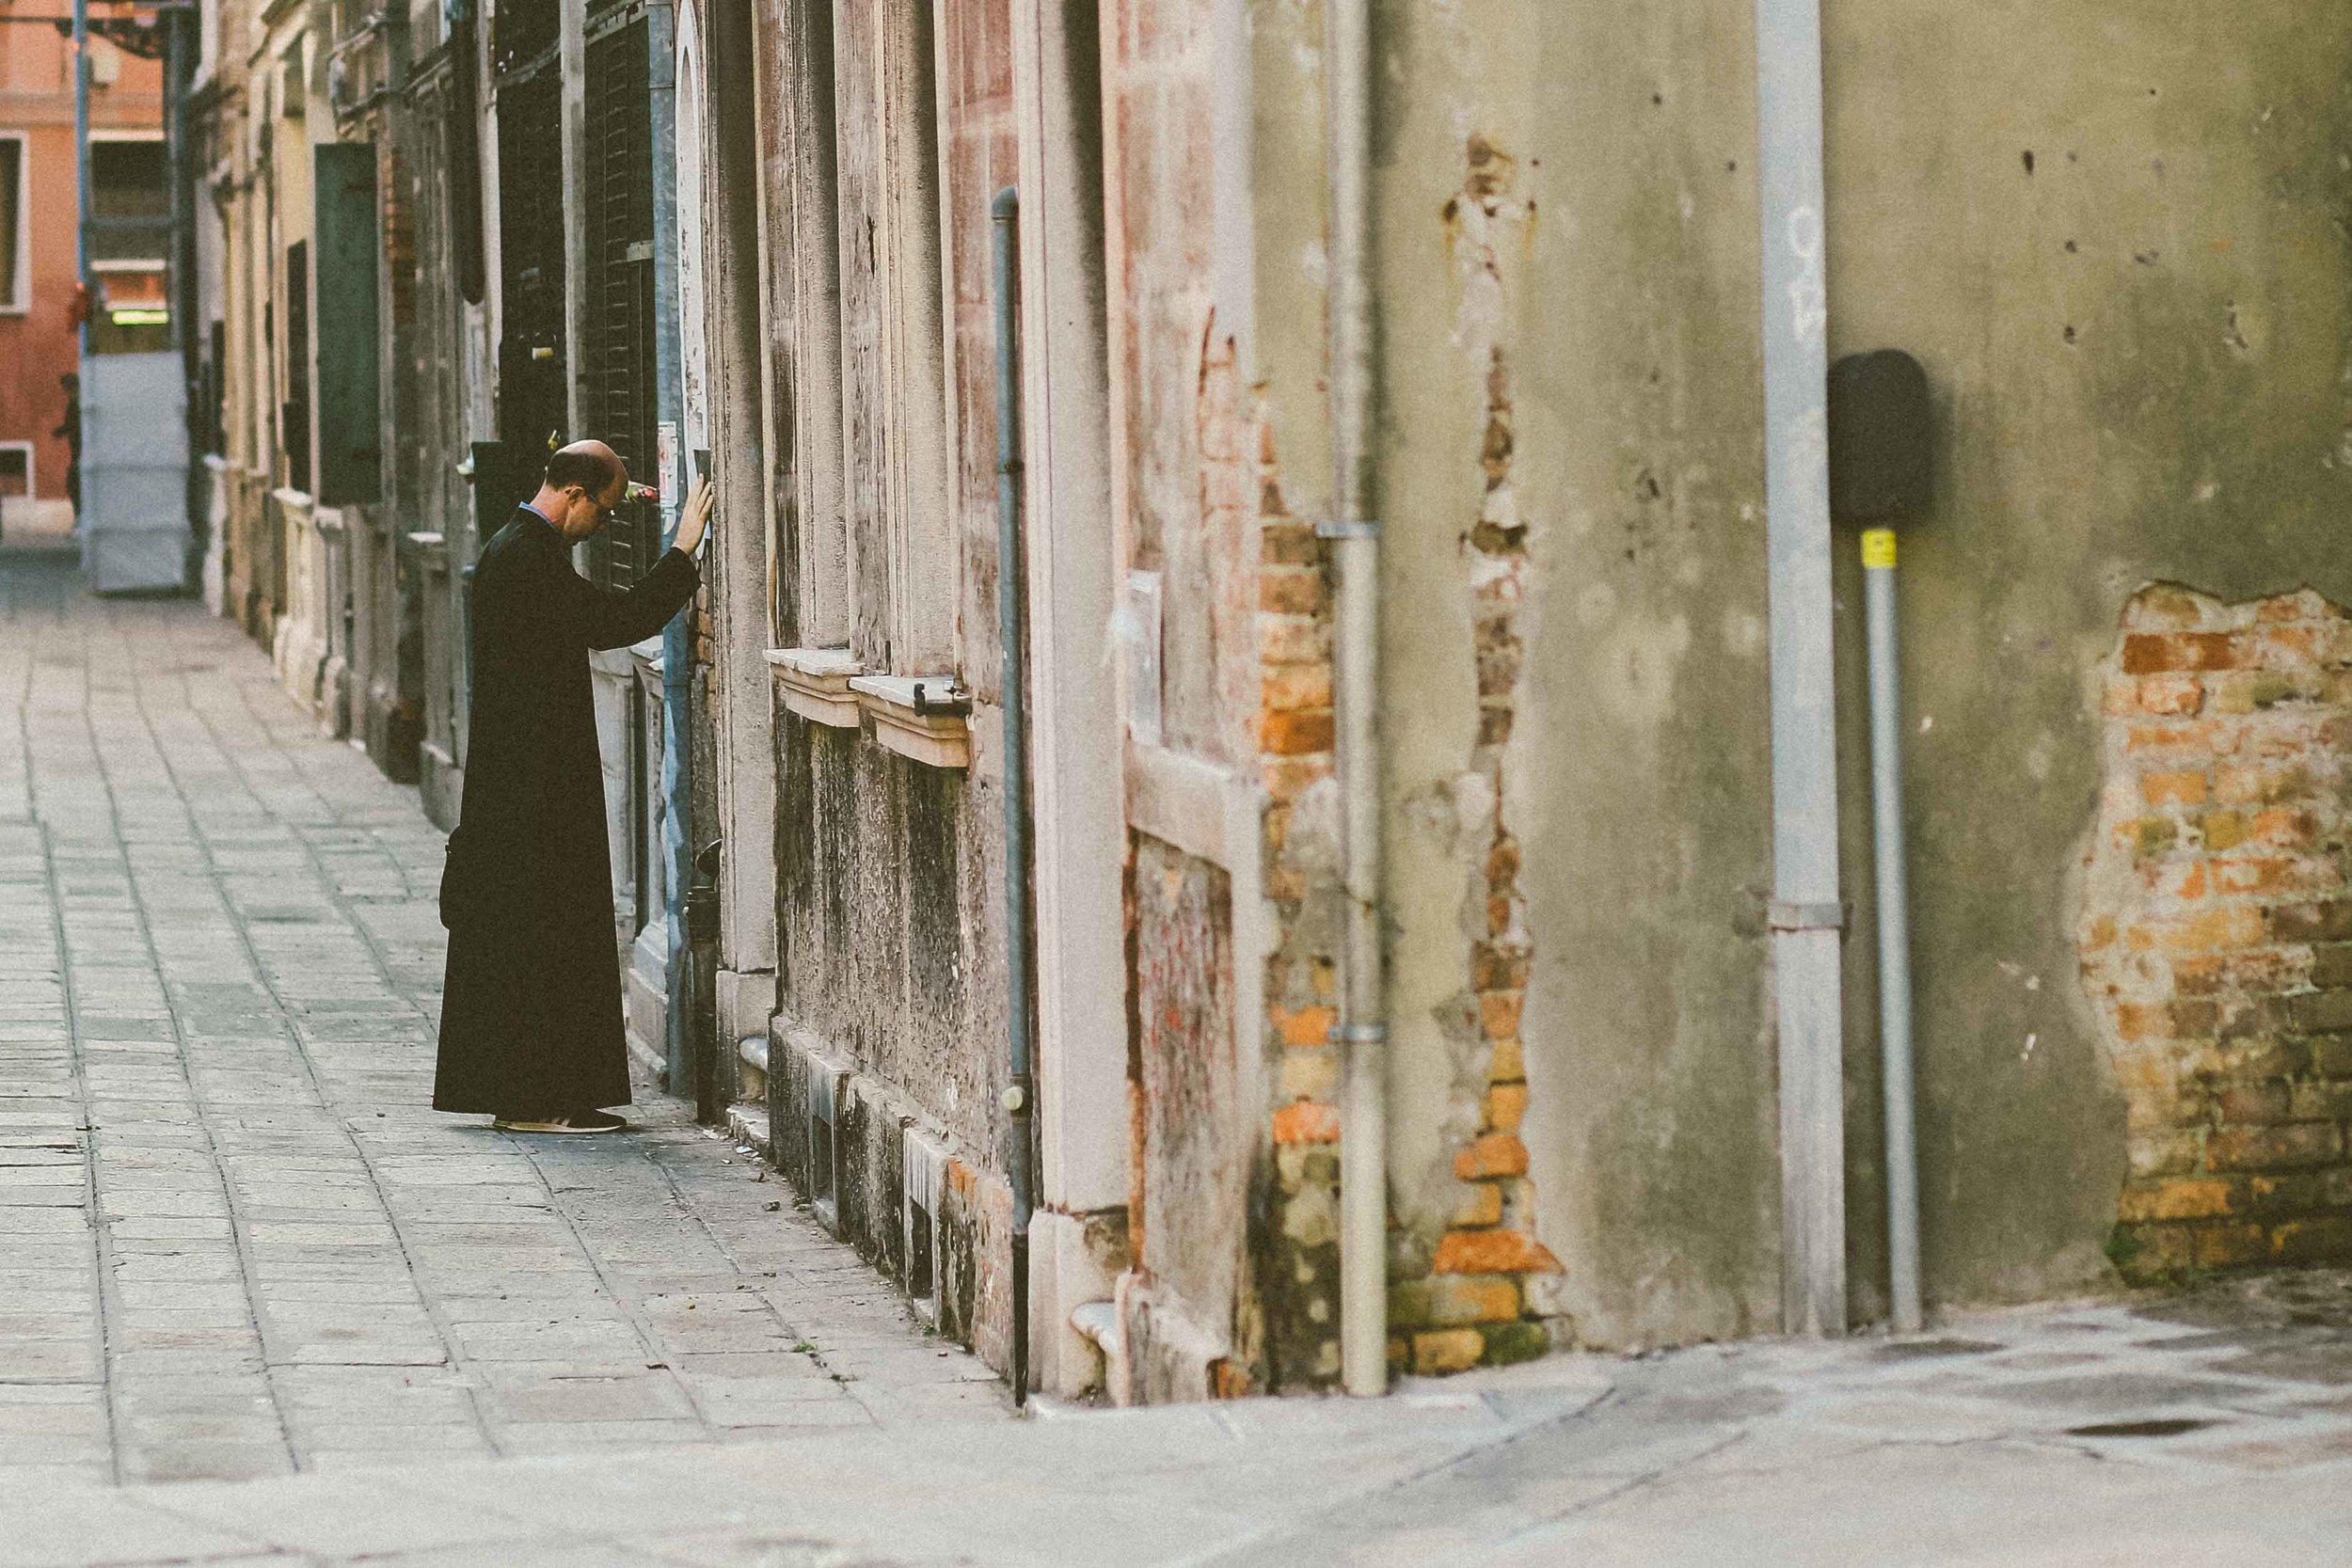 Street_Photographer_Venice_Italy1_1.jpg